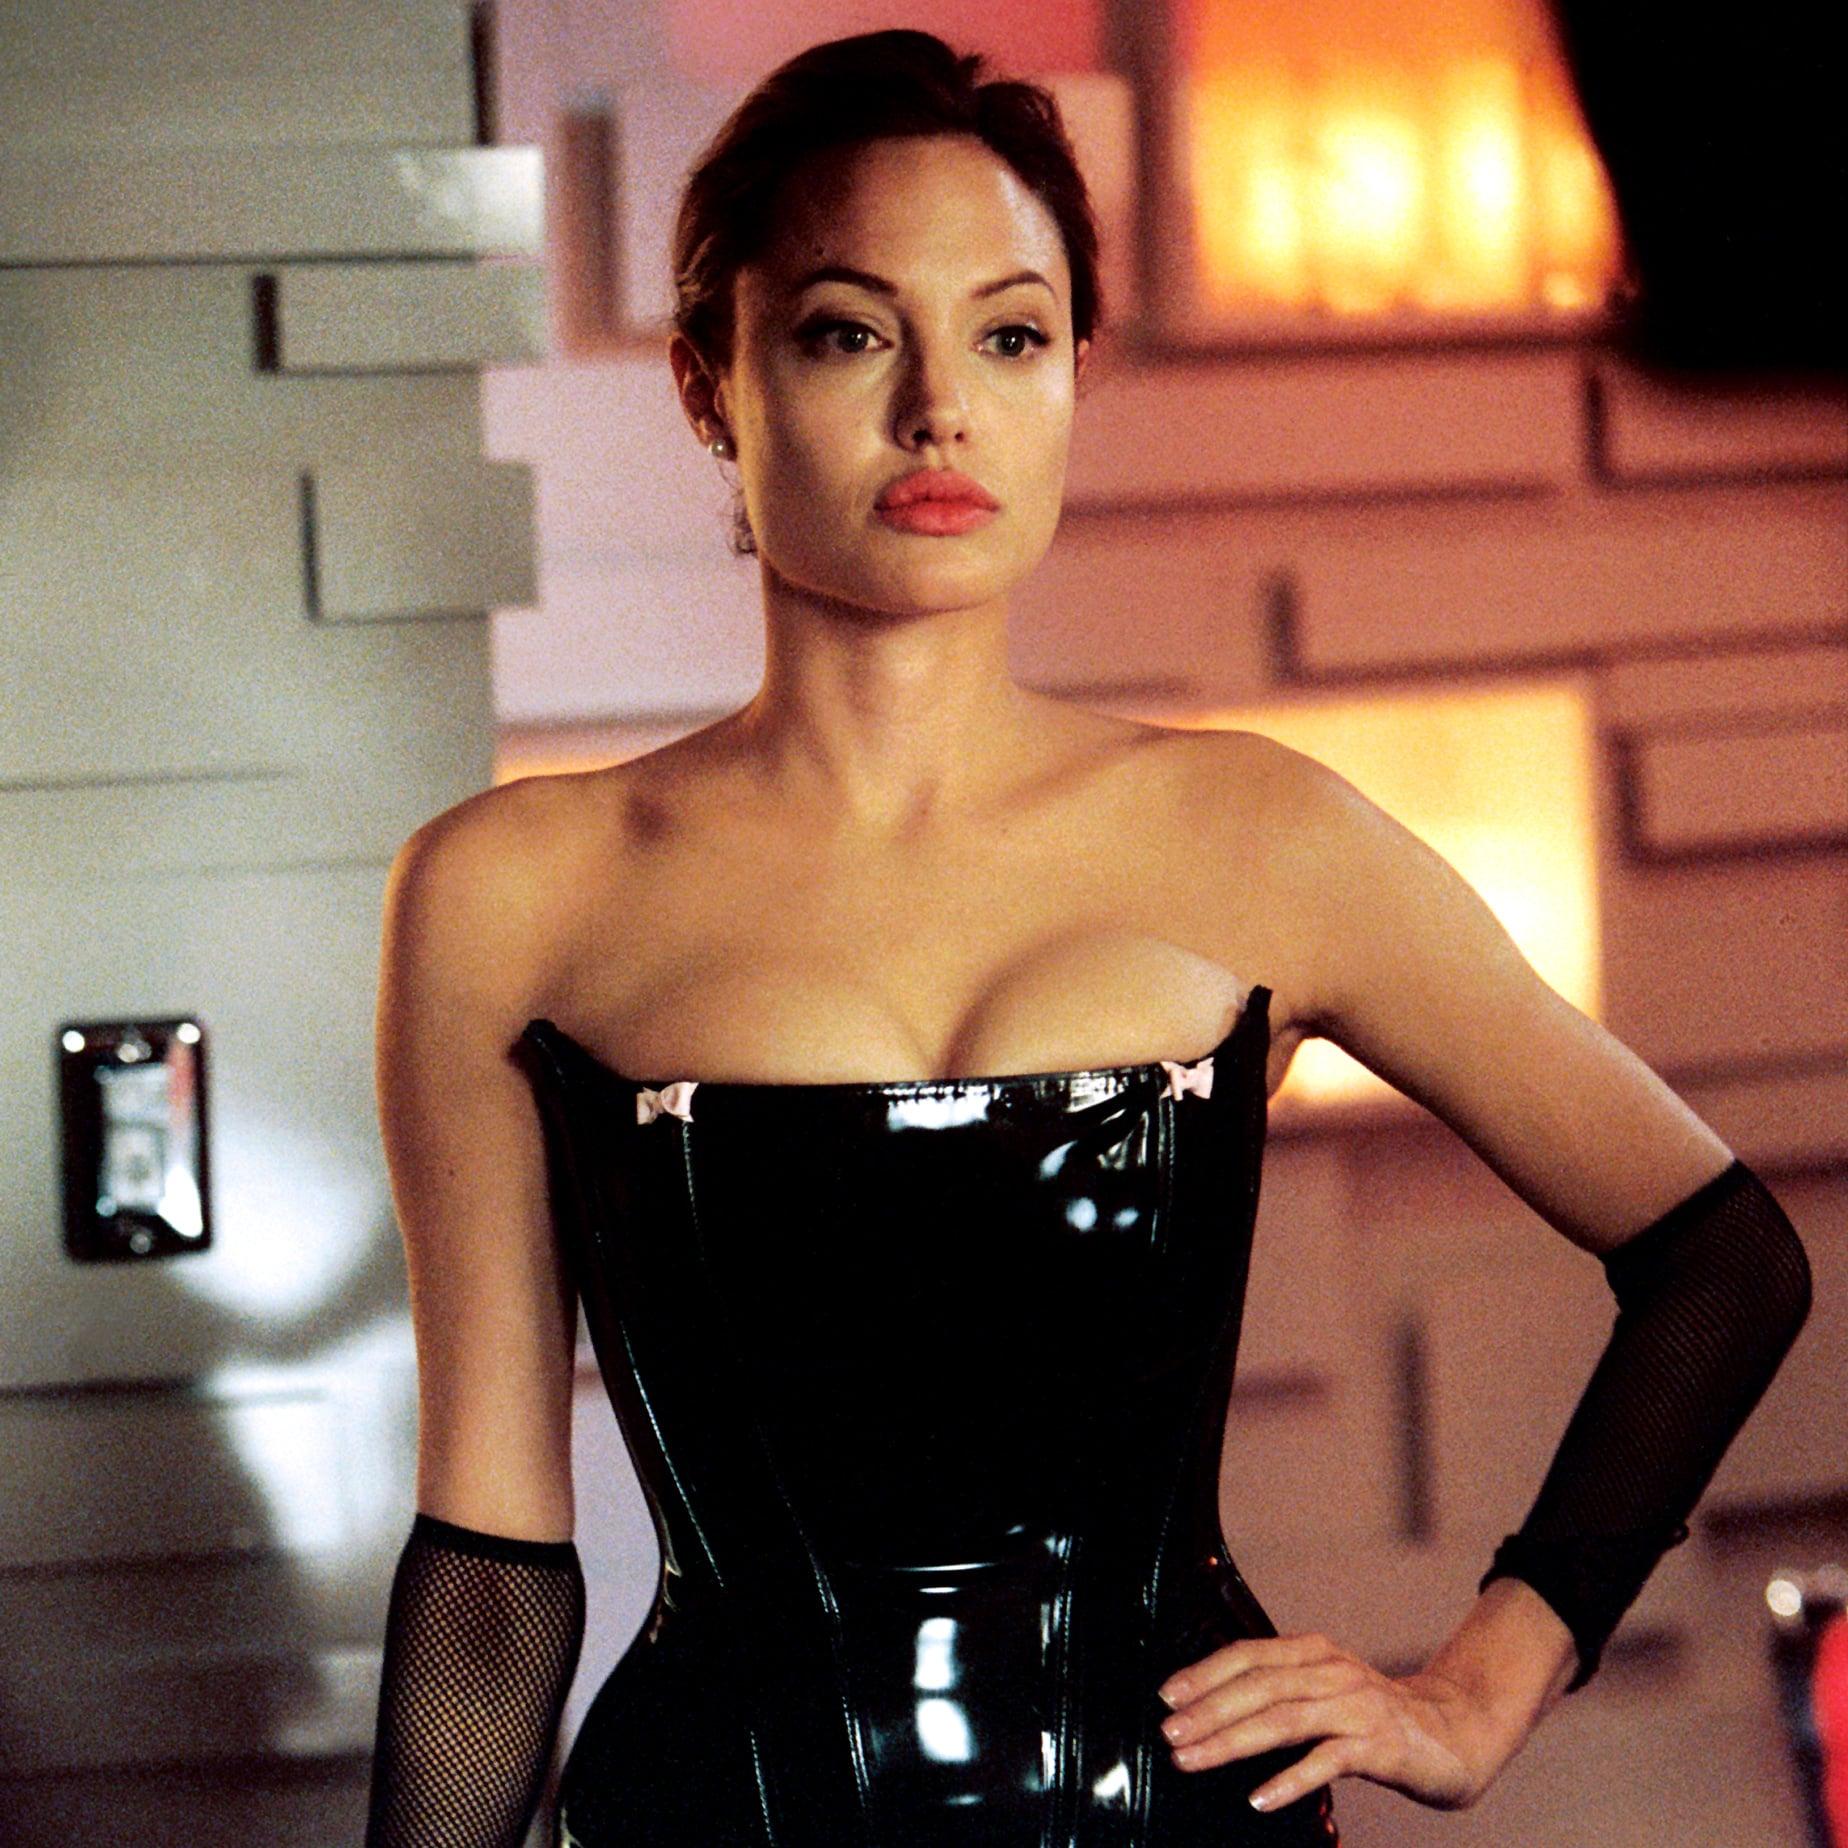 Angelina Jolie Hottest Pics photo 10